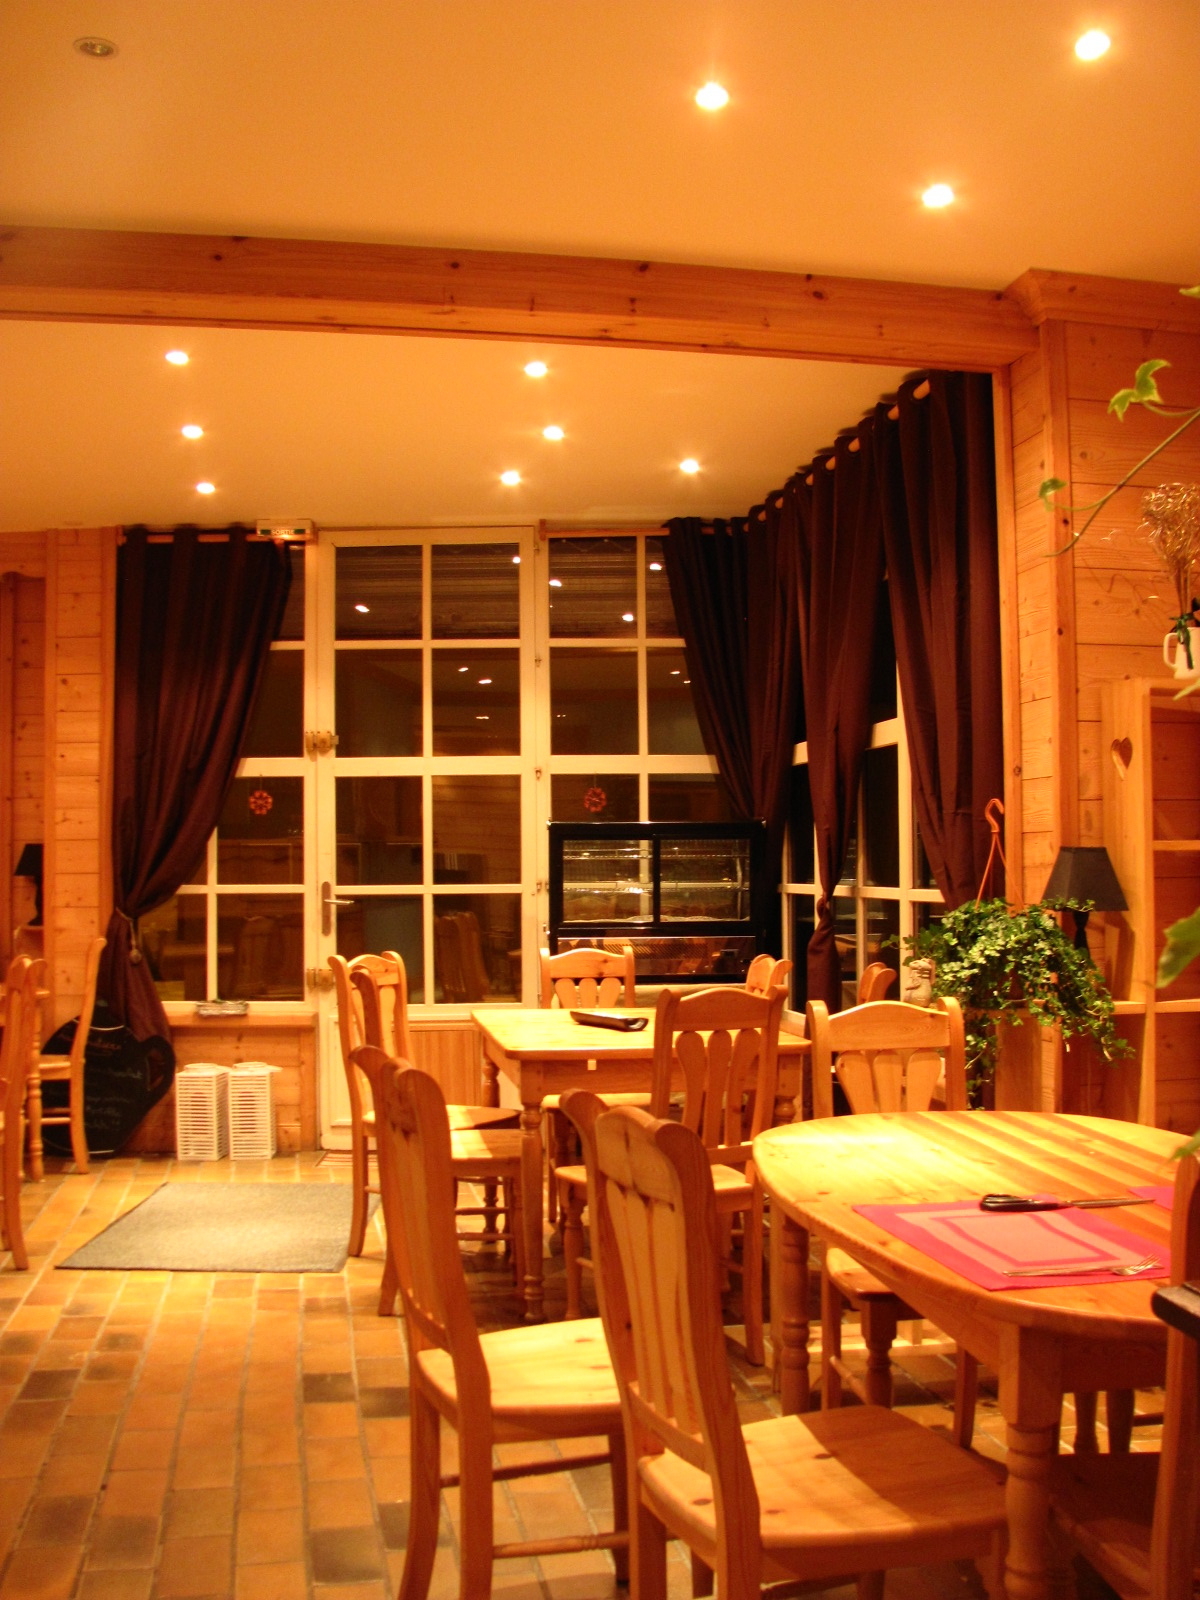 Restaurant auberge l 39 ombelle le miroir for Le miroir restaurant